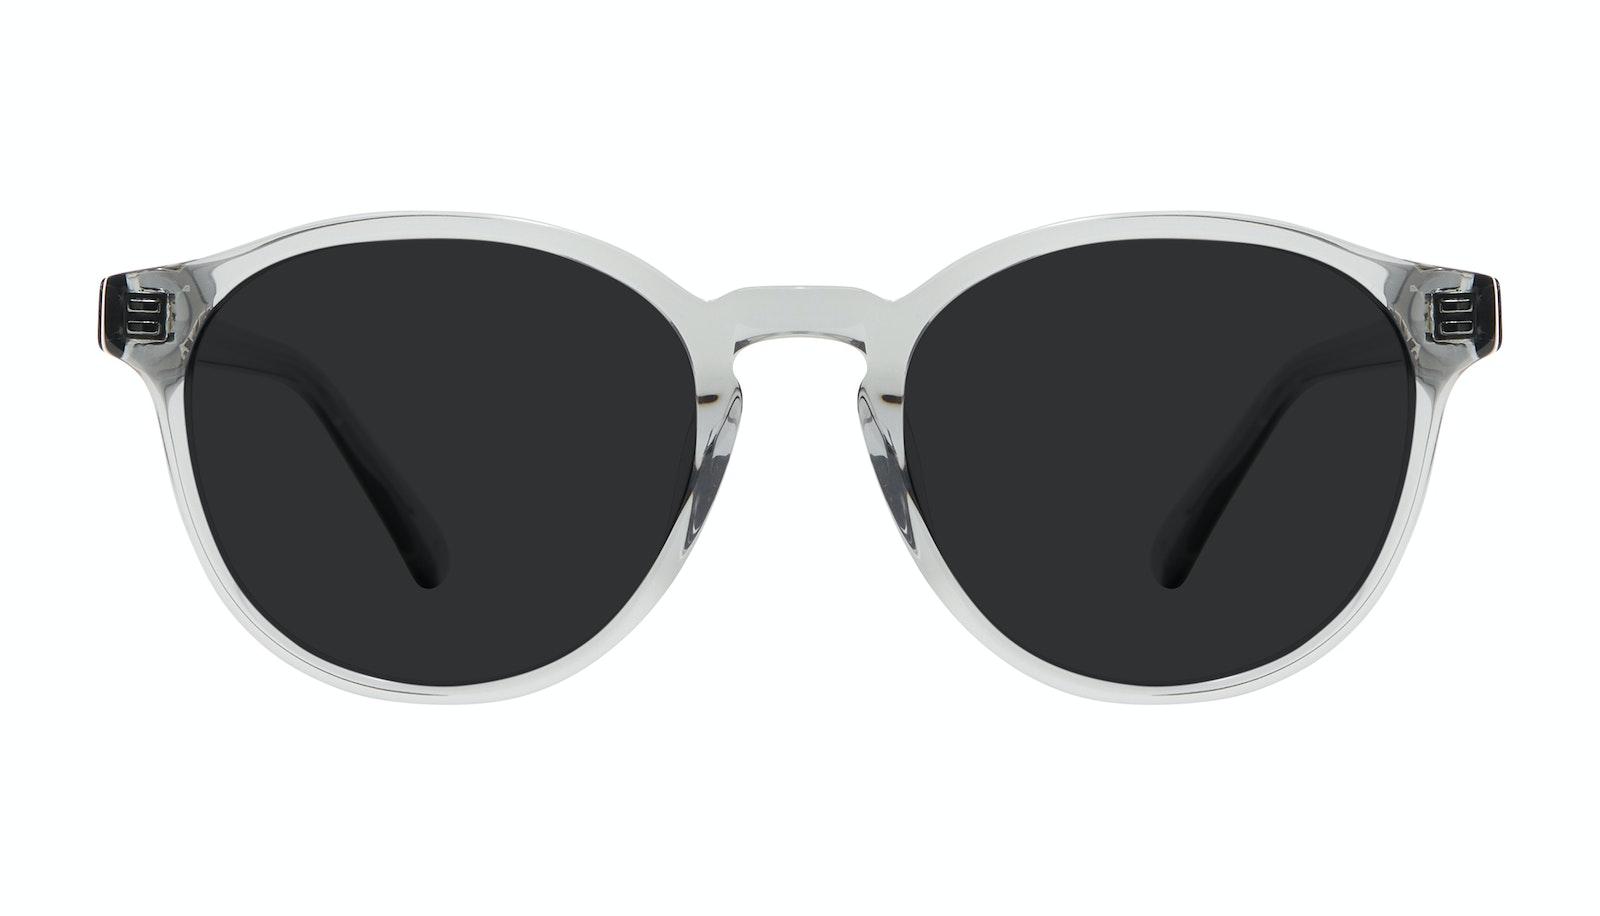 Affordable Fashion Glasses Round Sunglasses Men Aussie Storm